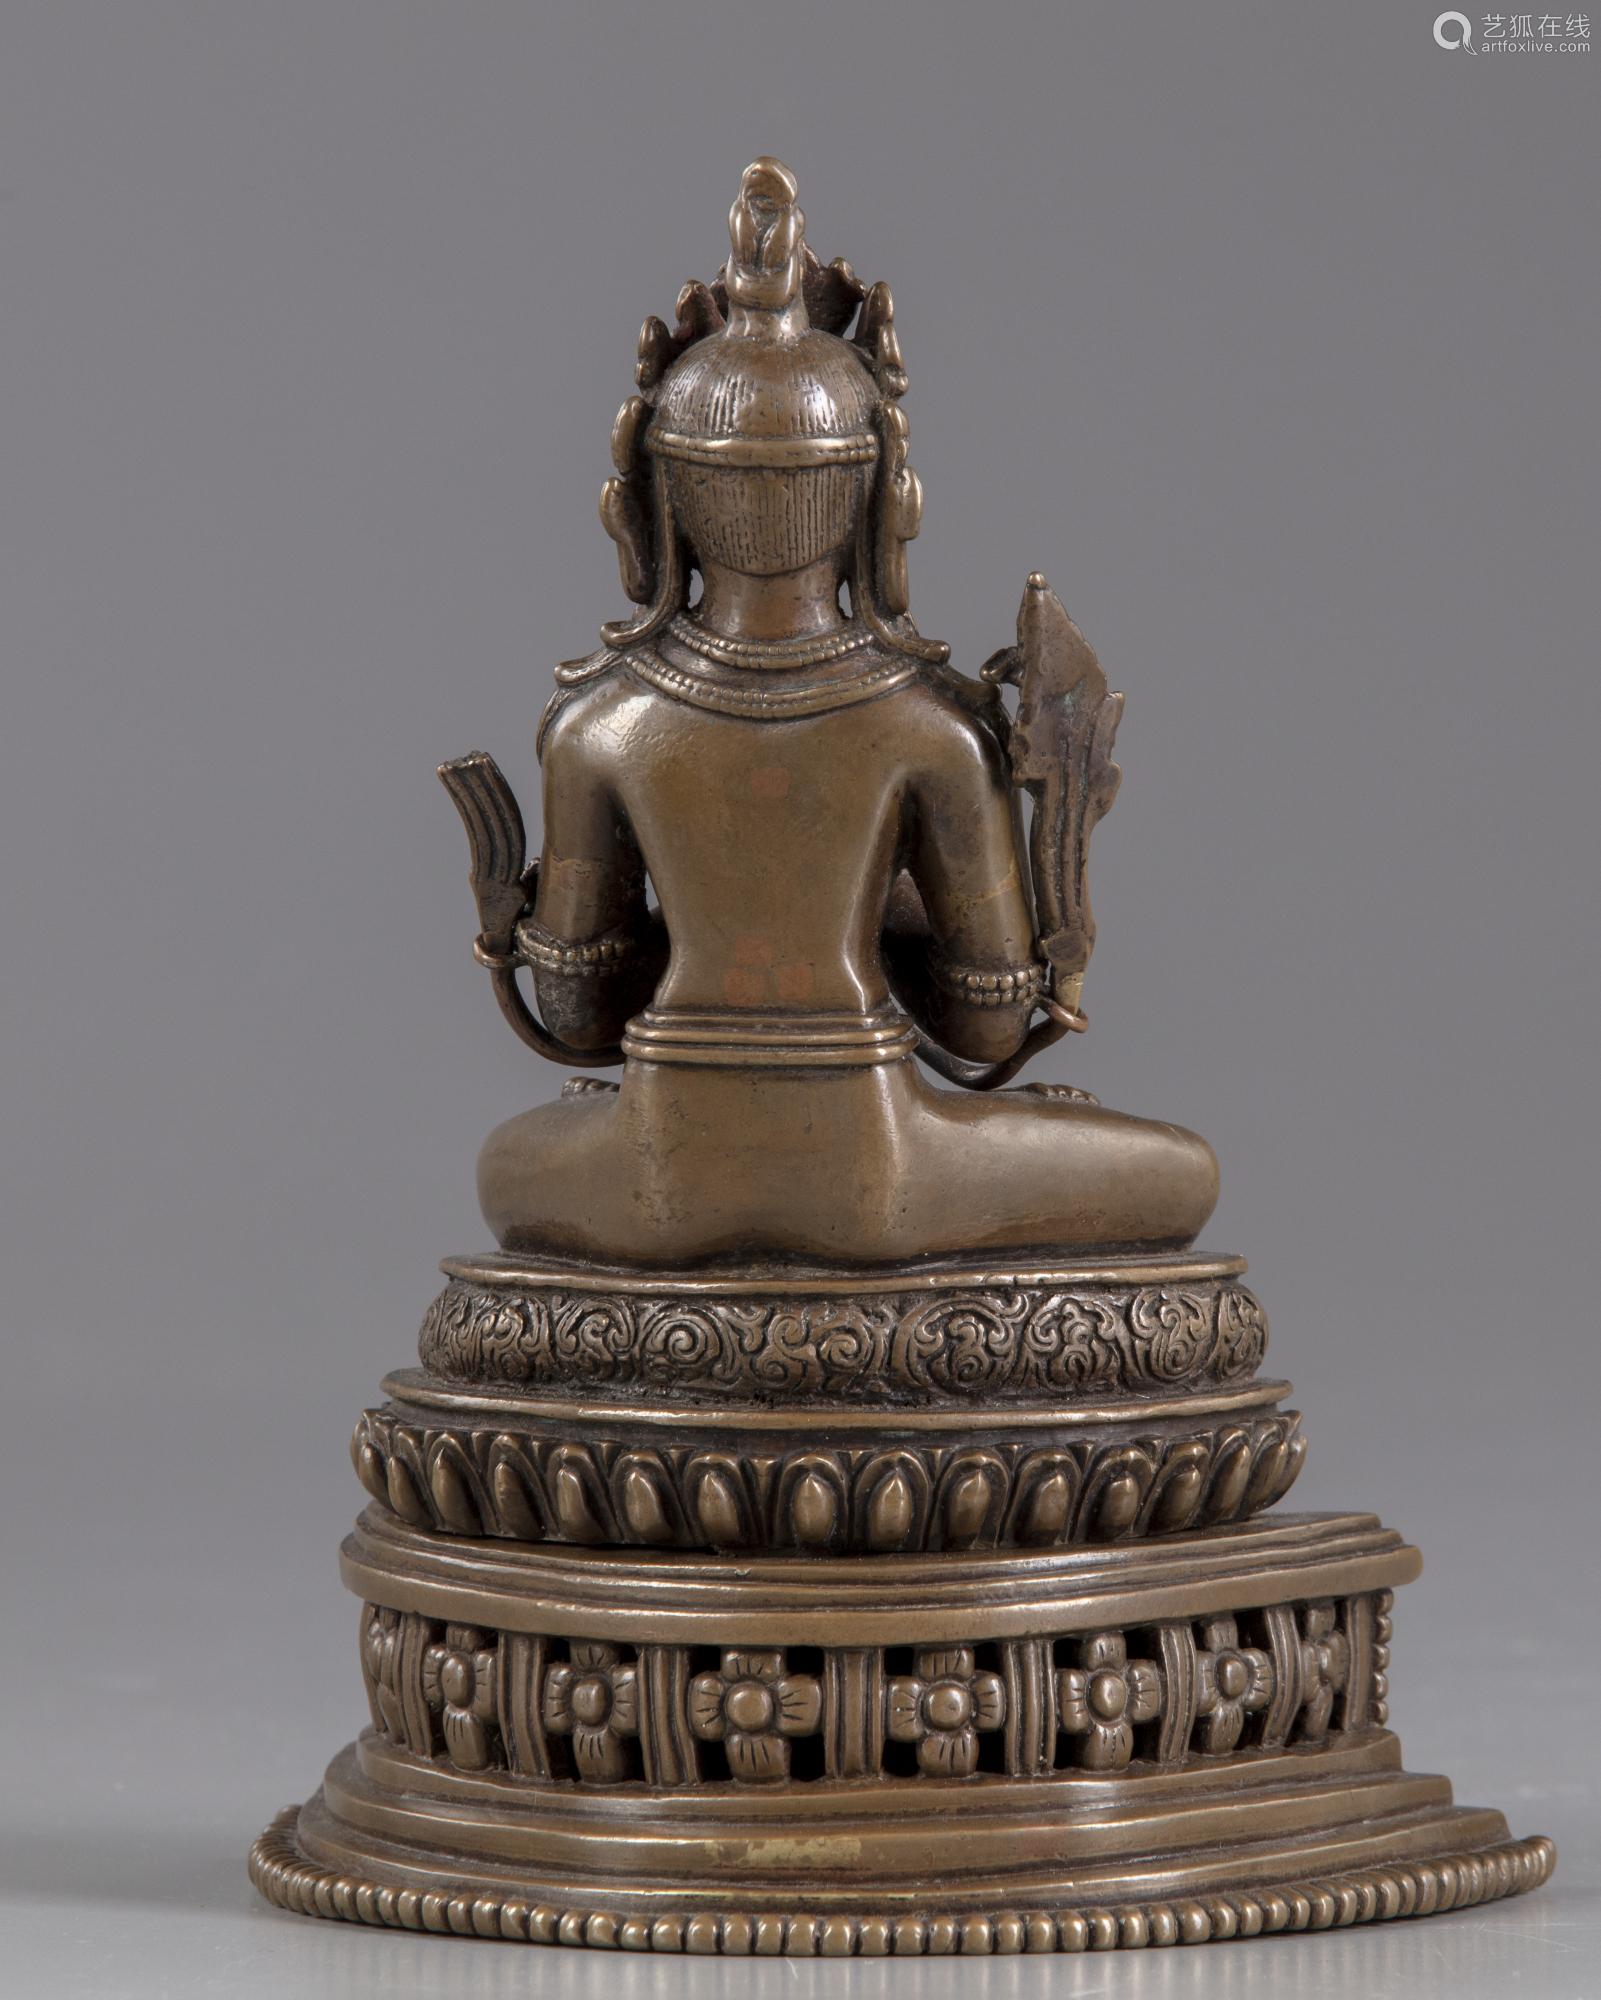 A Nepalese bronze figure of Vairocana